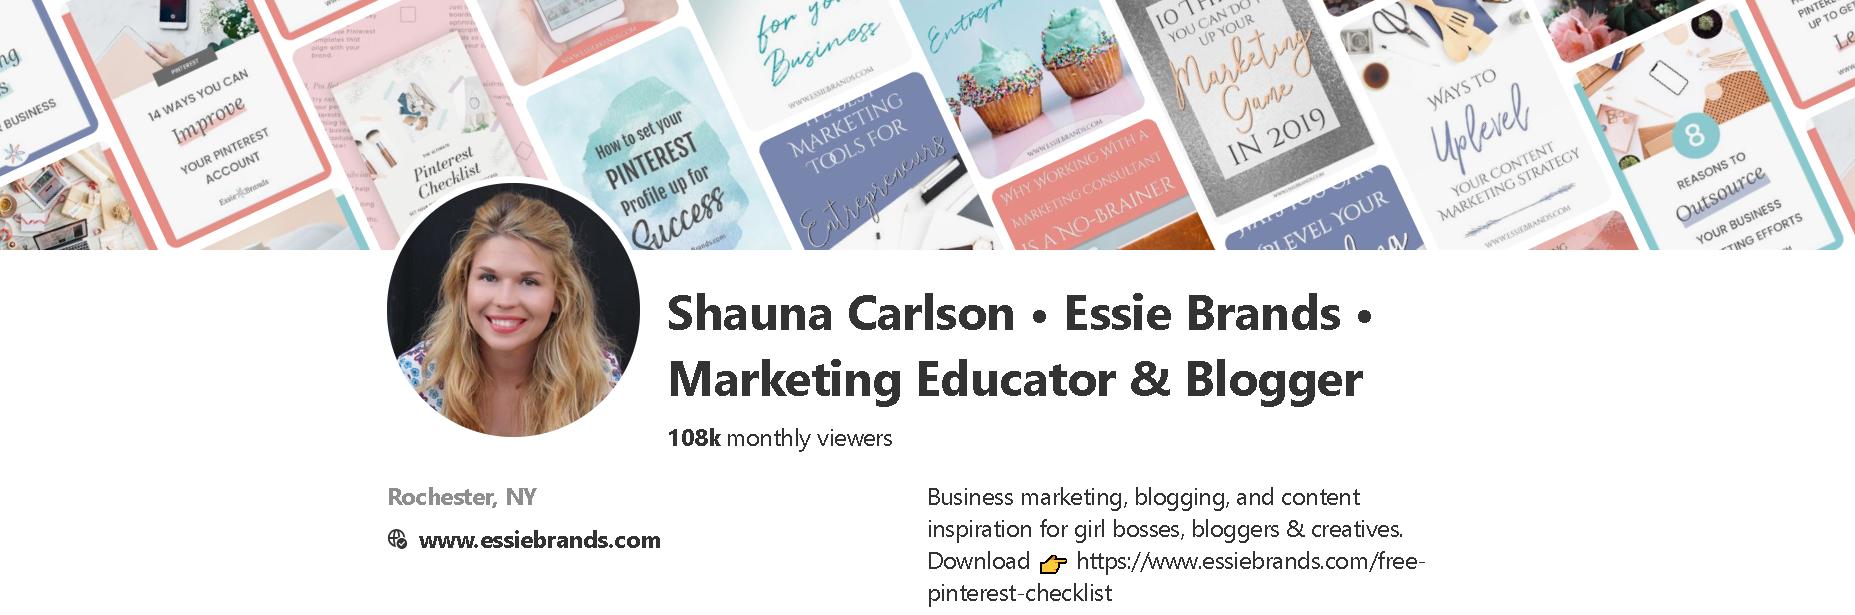 Shauna Carlson of Essie Brands Pinterest Profile Screenshot